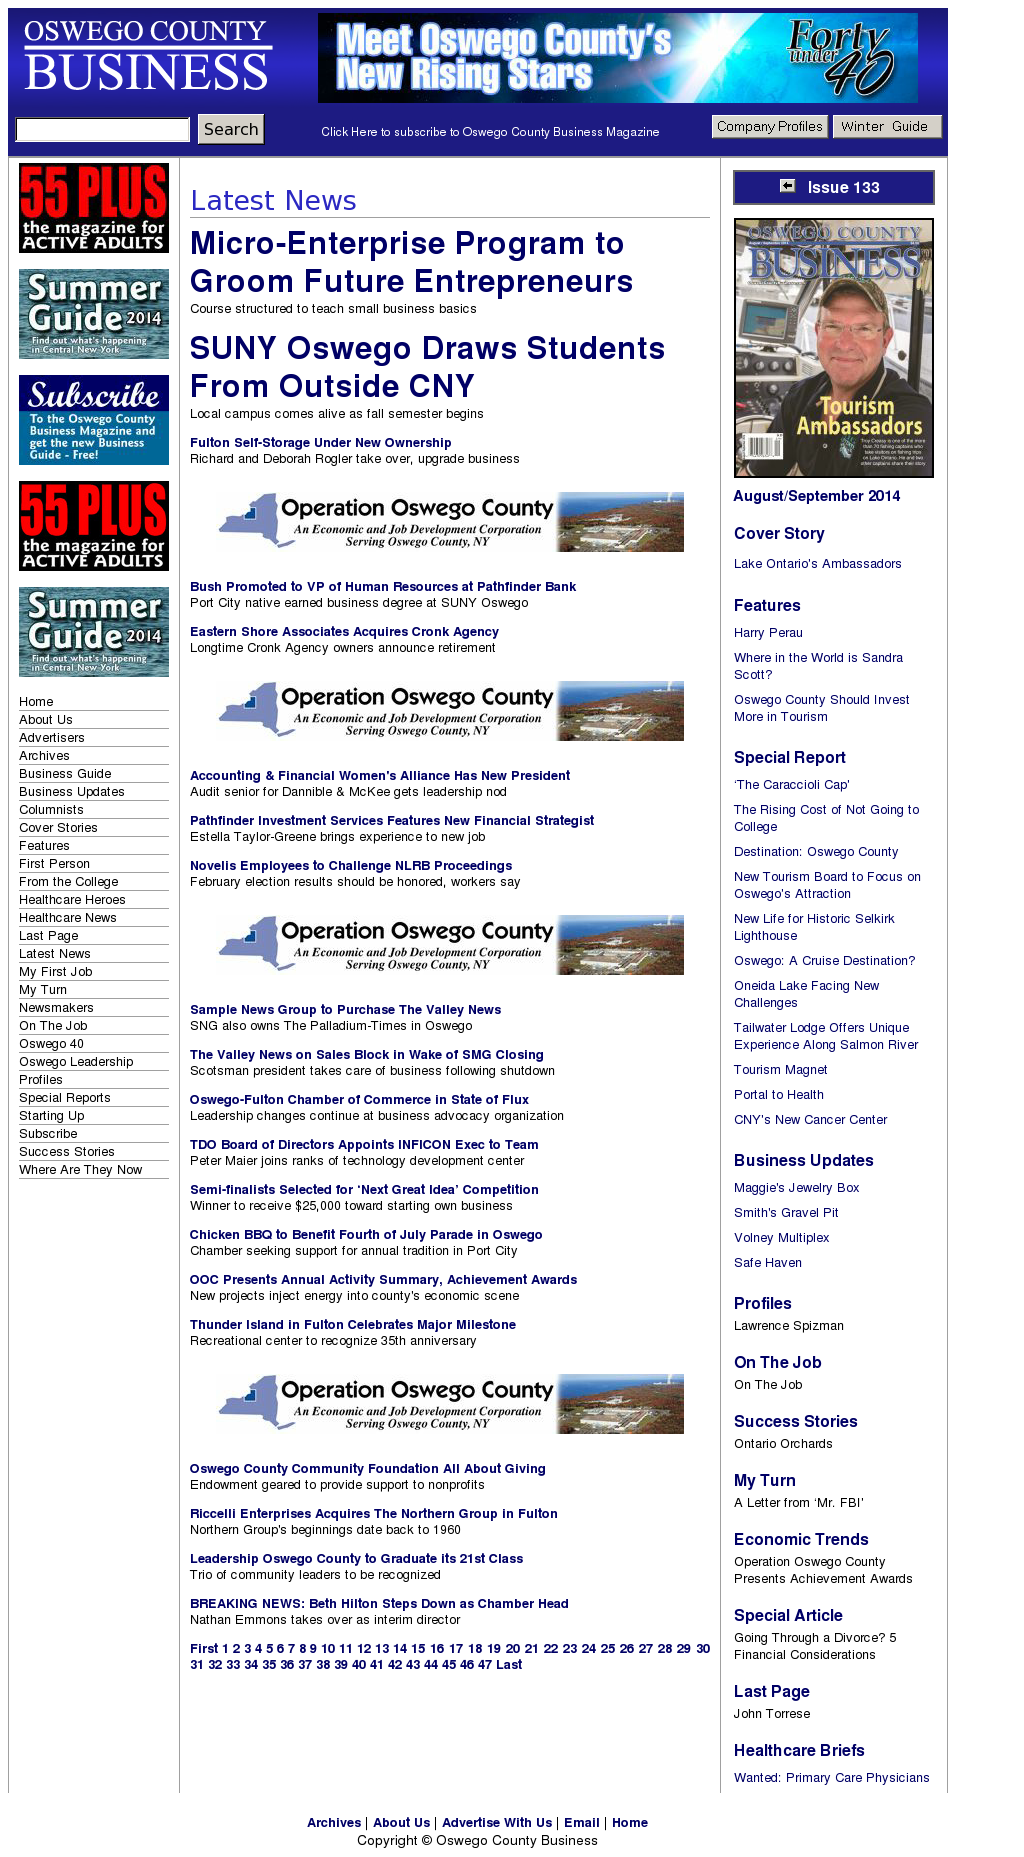 Oswego County Business Magazine Competitors, Revenue and